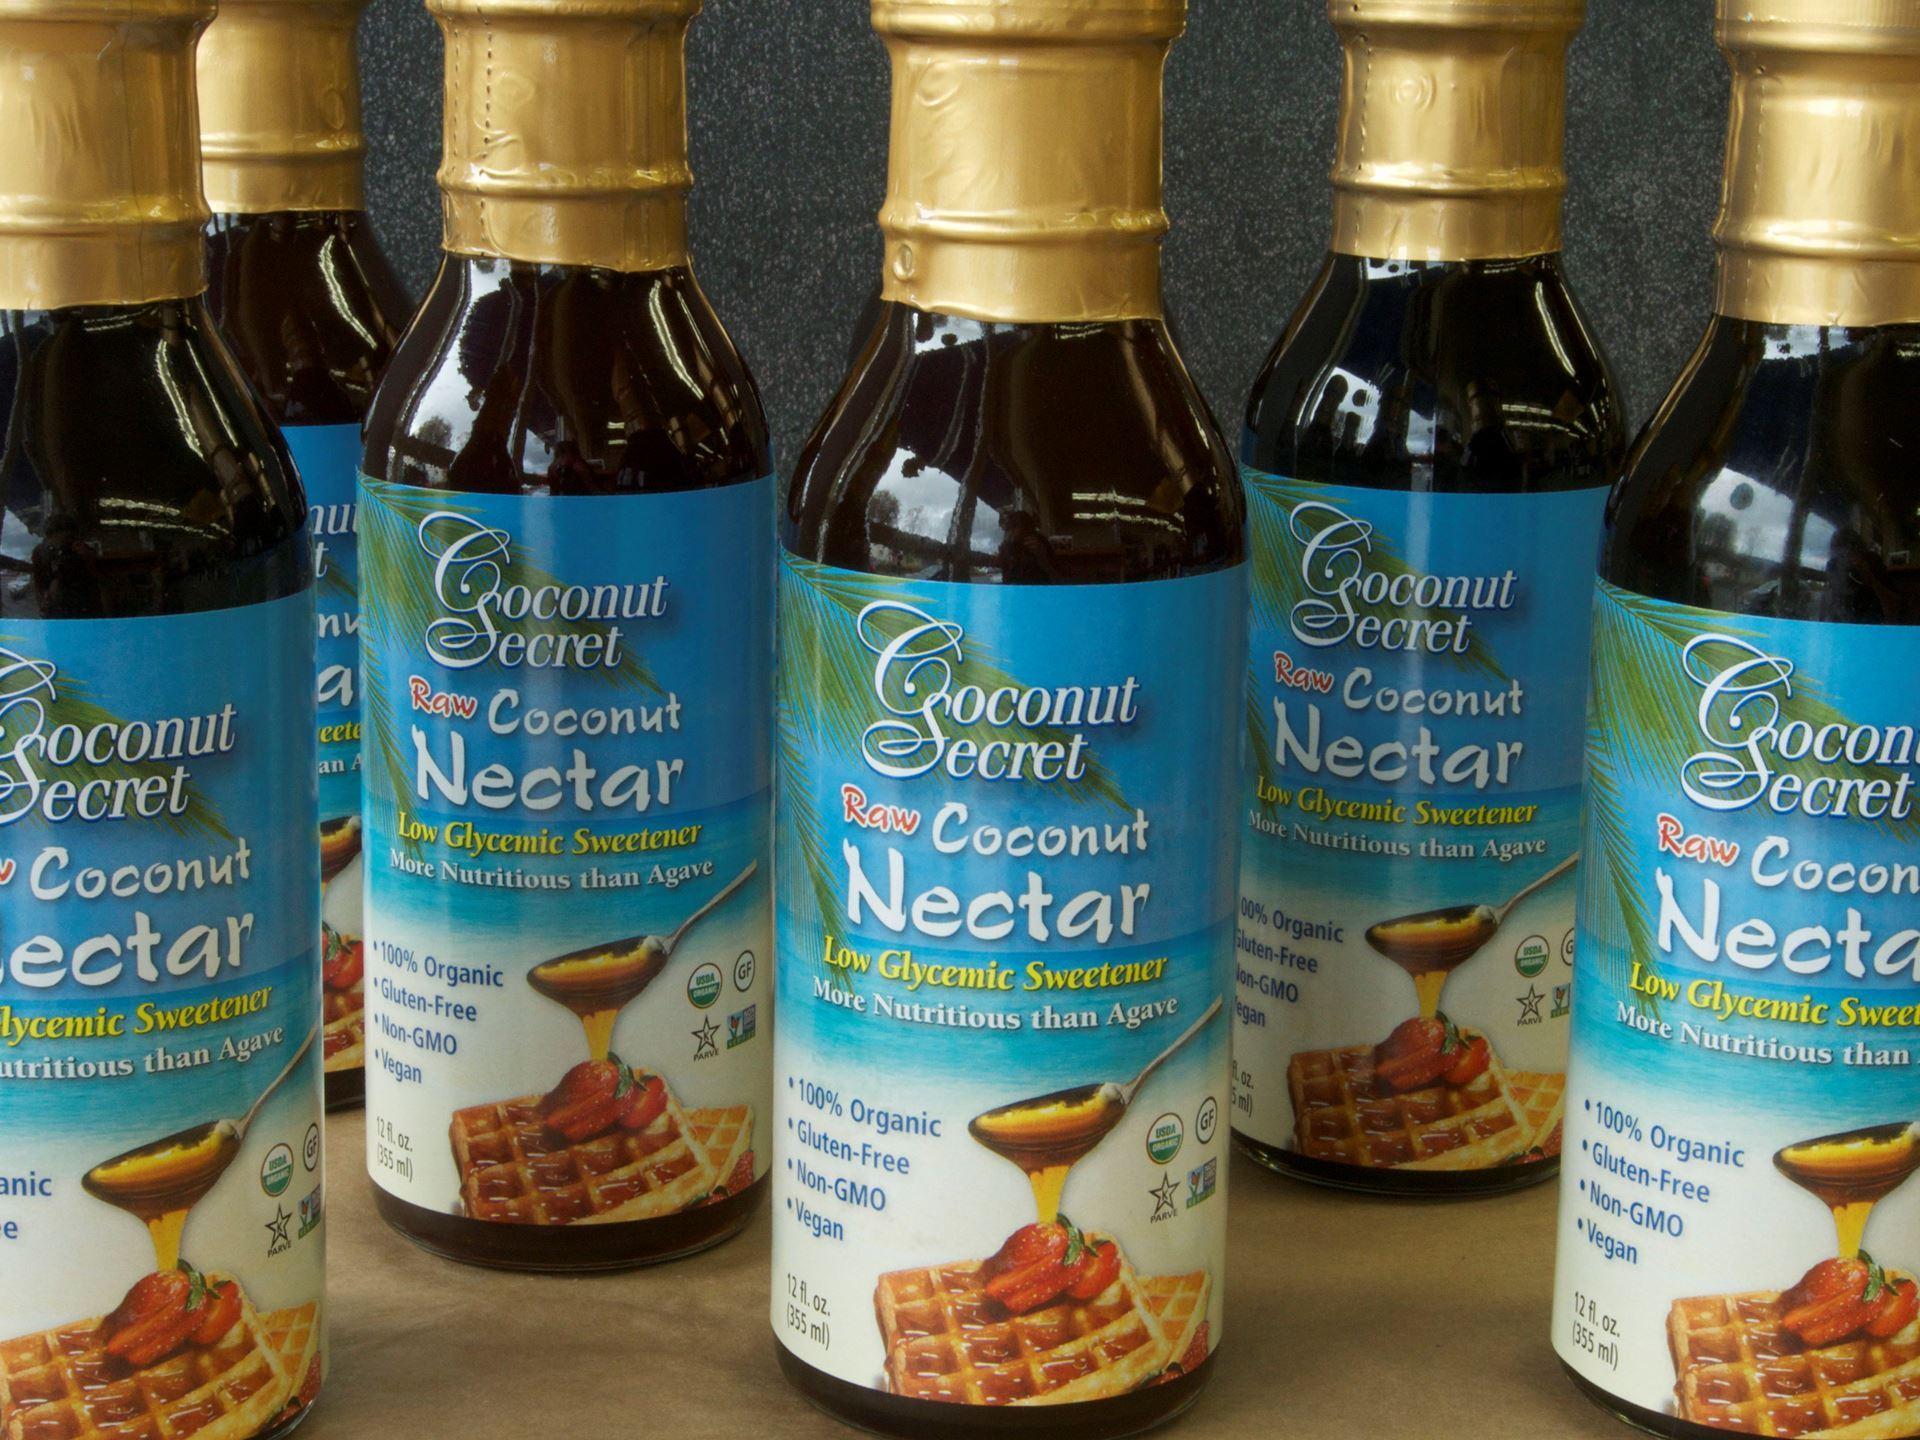 Picture of Coconut Secret Coconut Nectar